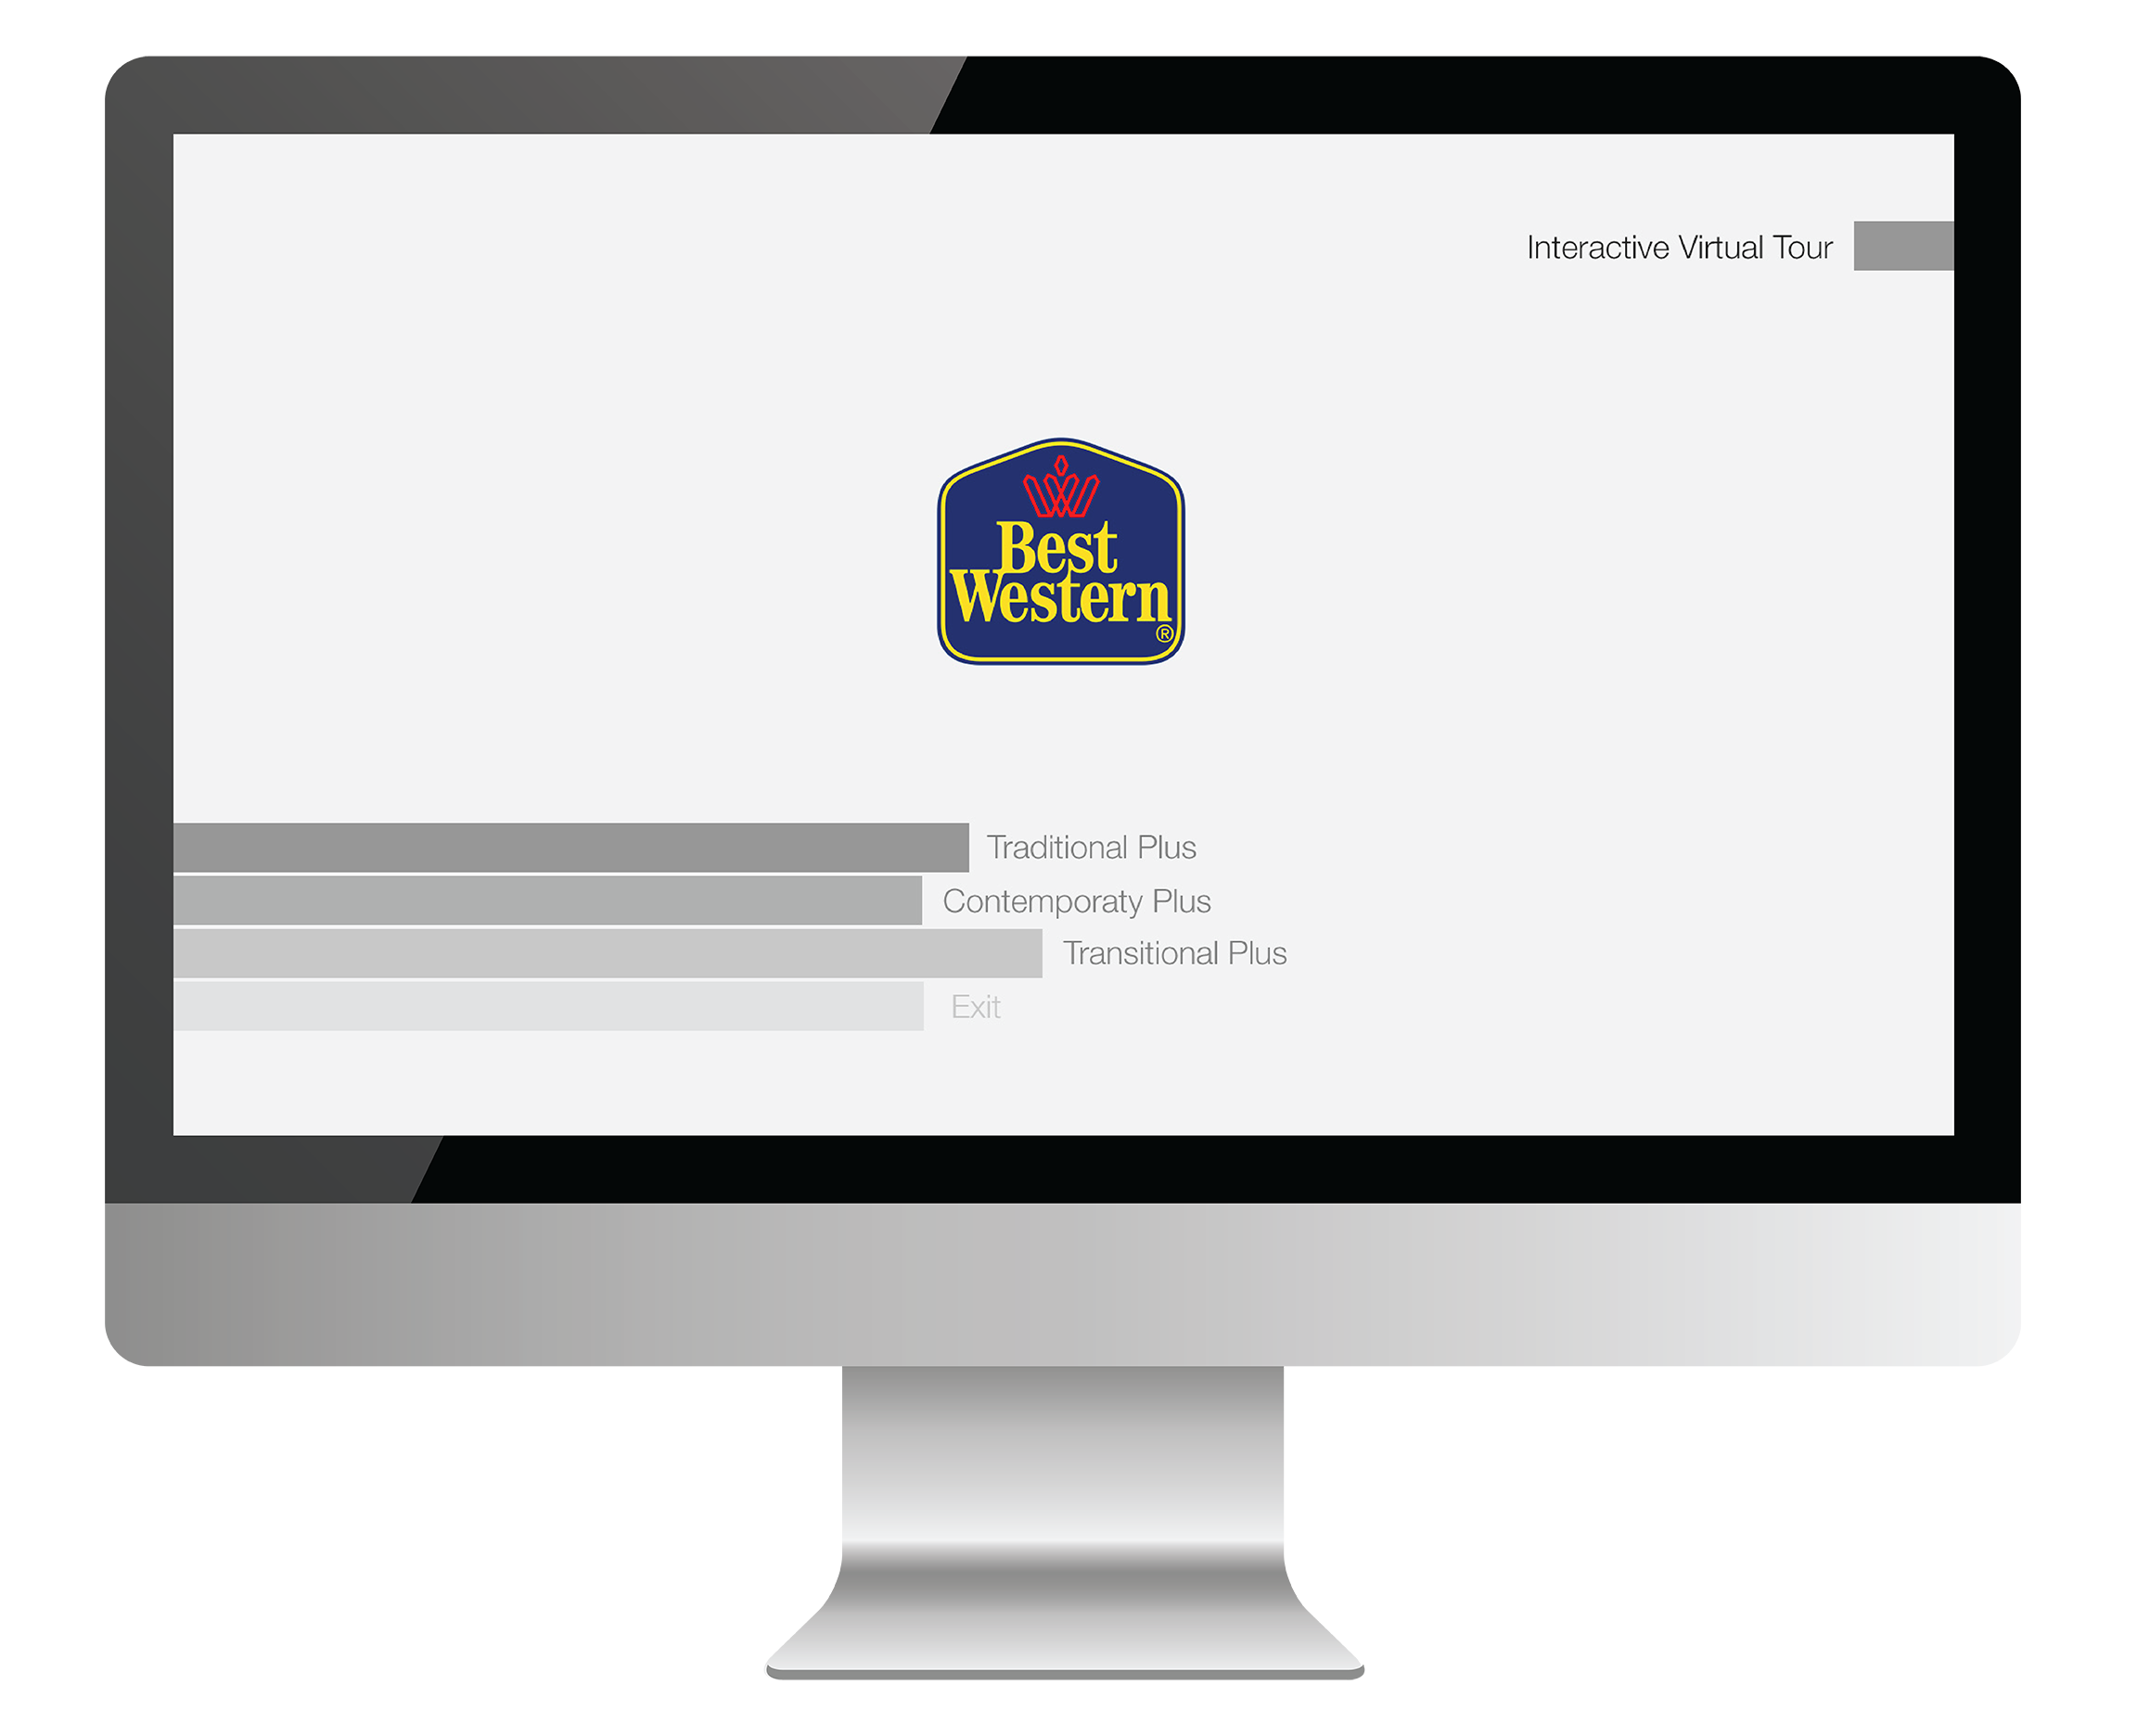 asteriskos-design-cg-render-bestwestern-hotel-realistic-photorealistic-interior-architecture-product-menu-app-unity-userinterface.png